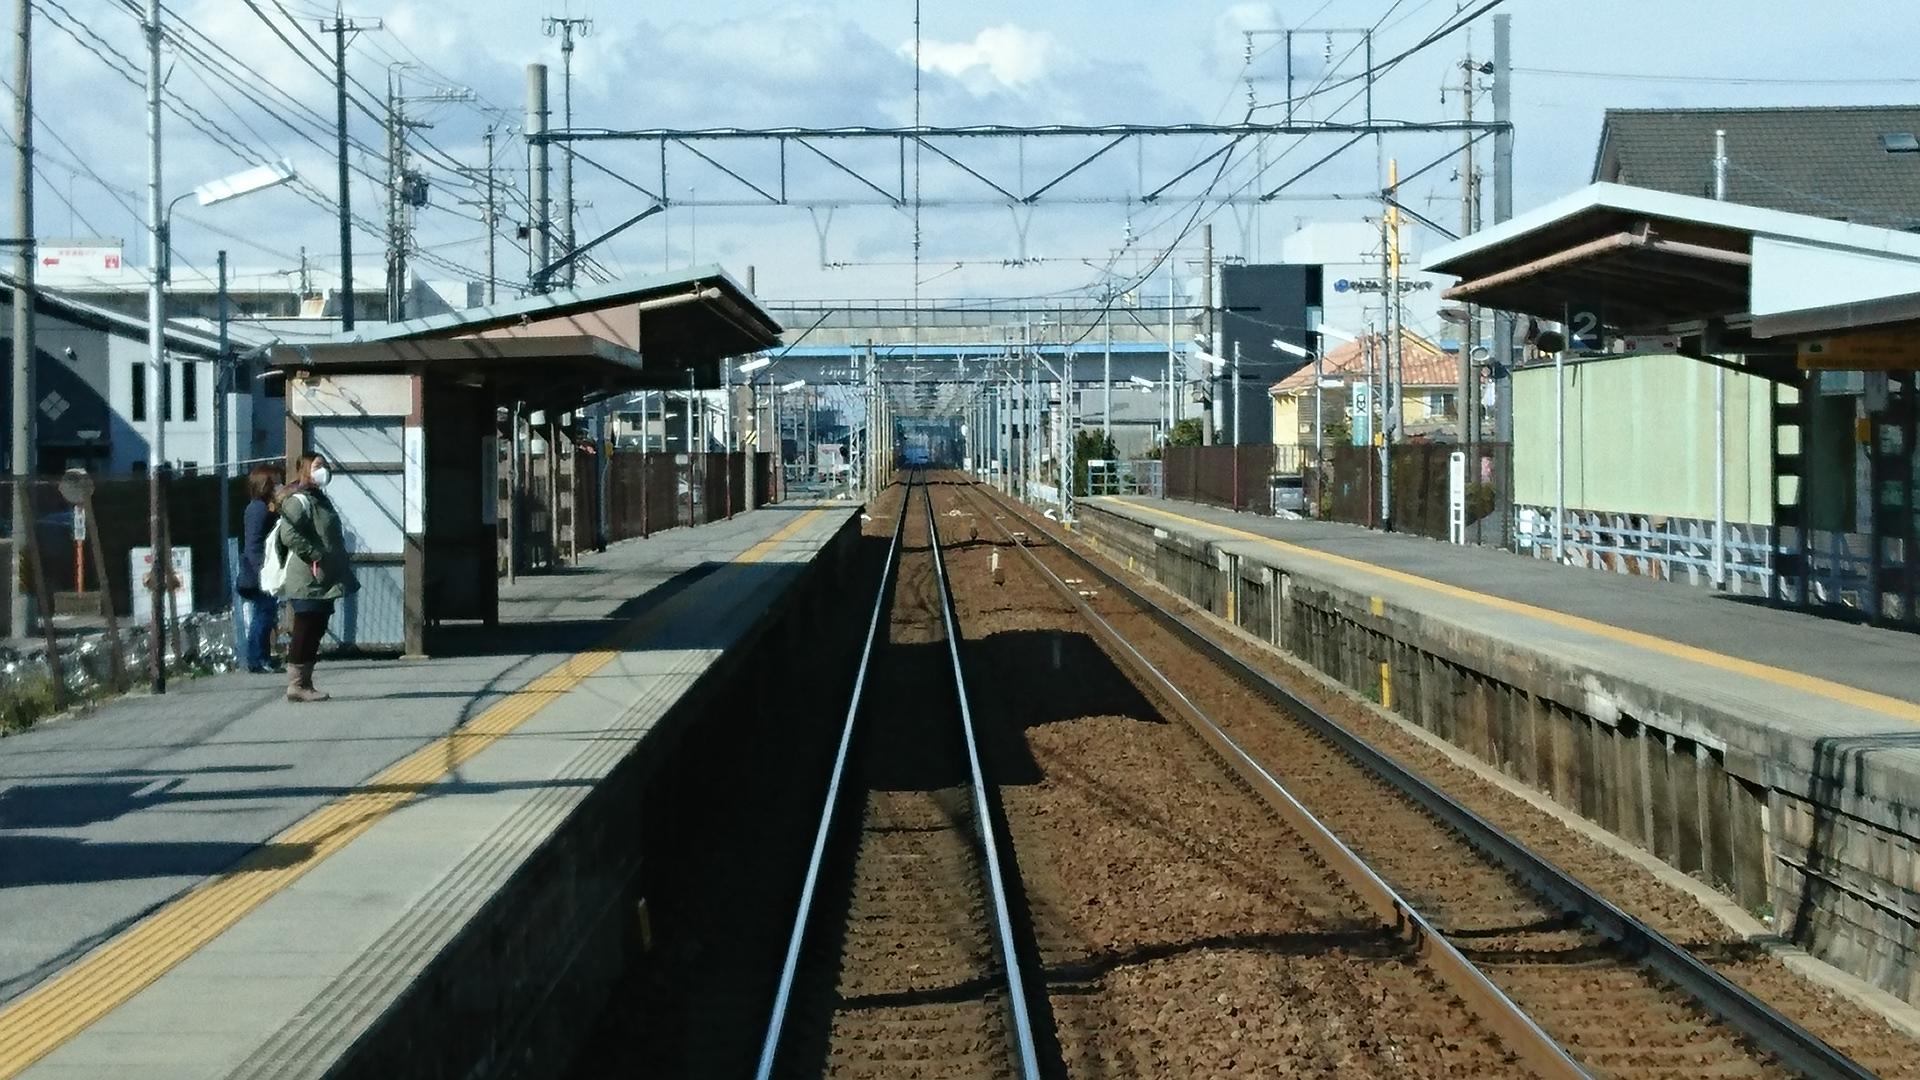 2017.2.10 名古屋本線 (10) 岐阜いき急行 - 牛田 1920-1080